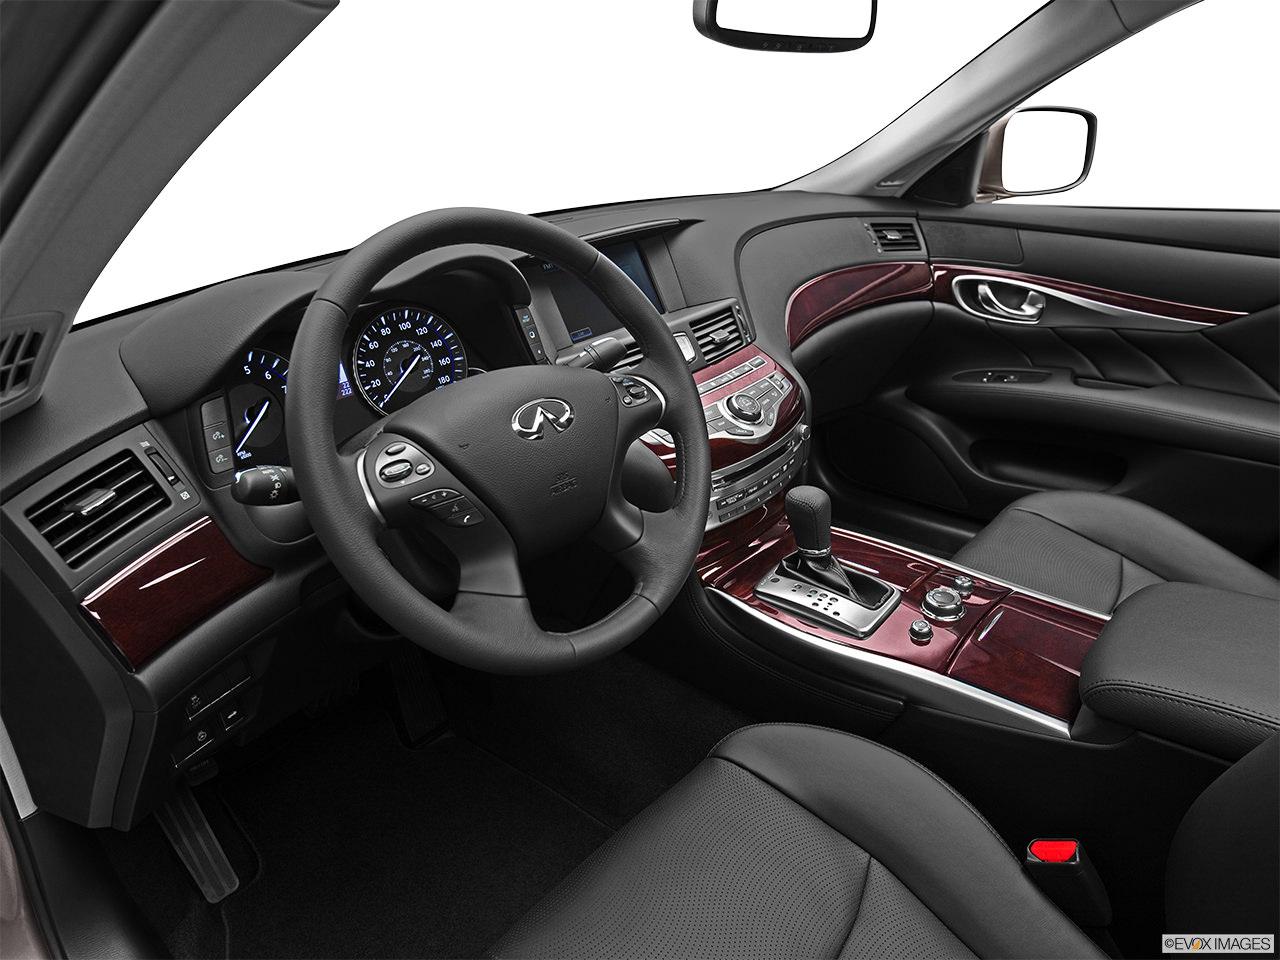 Infiniti M Hybrid 2012 Interior